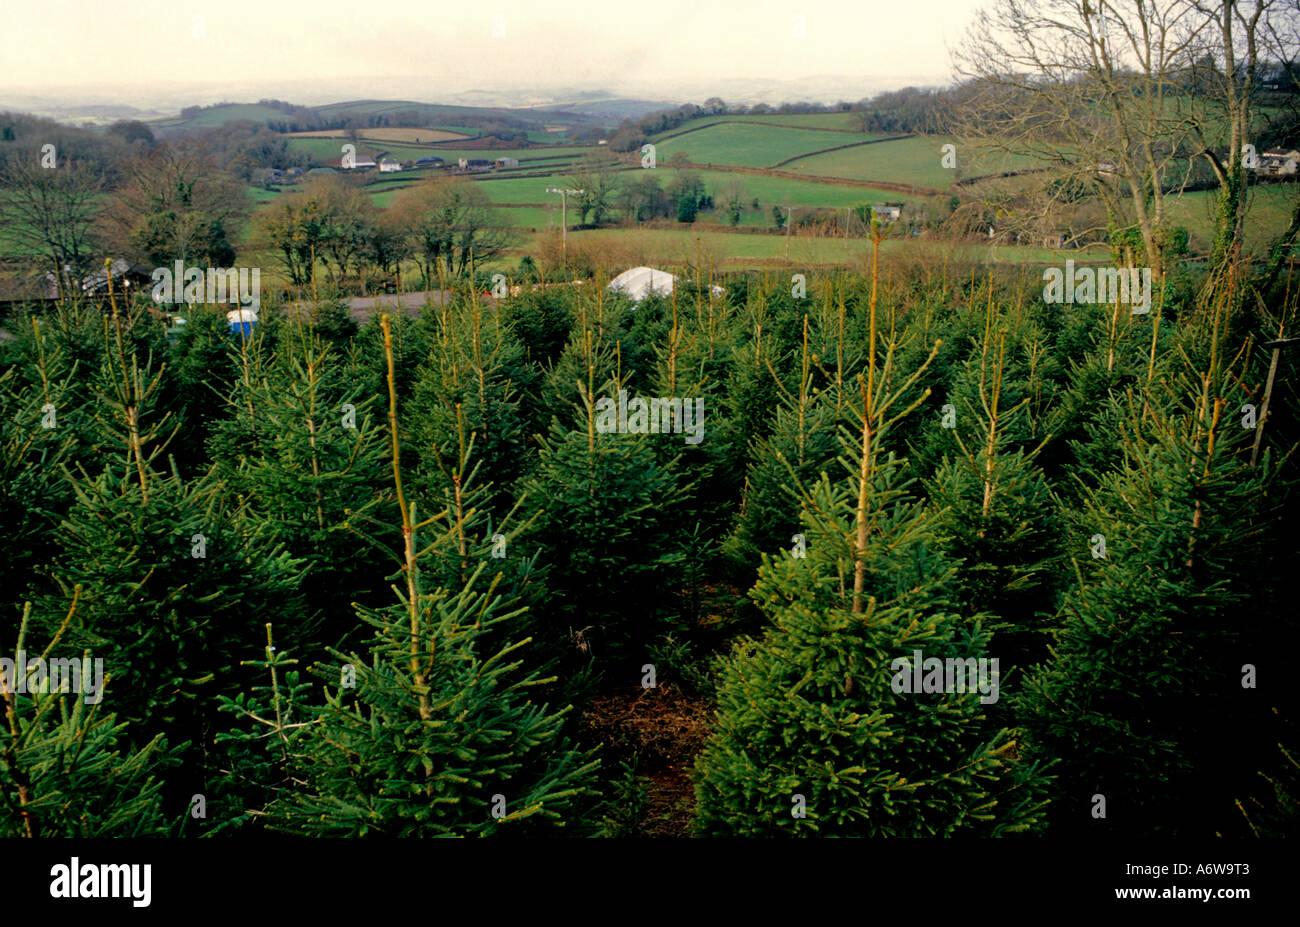 CHRISTMAS TREE PLANTATION AT MARLDON CHRISTMAS TREE FARM, PAIGNTON ...